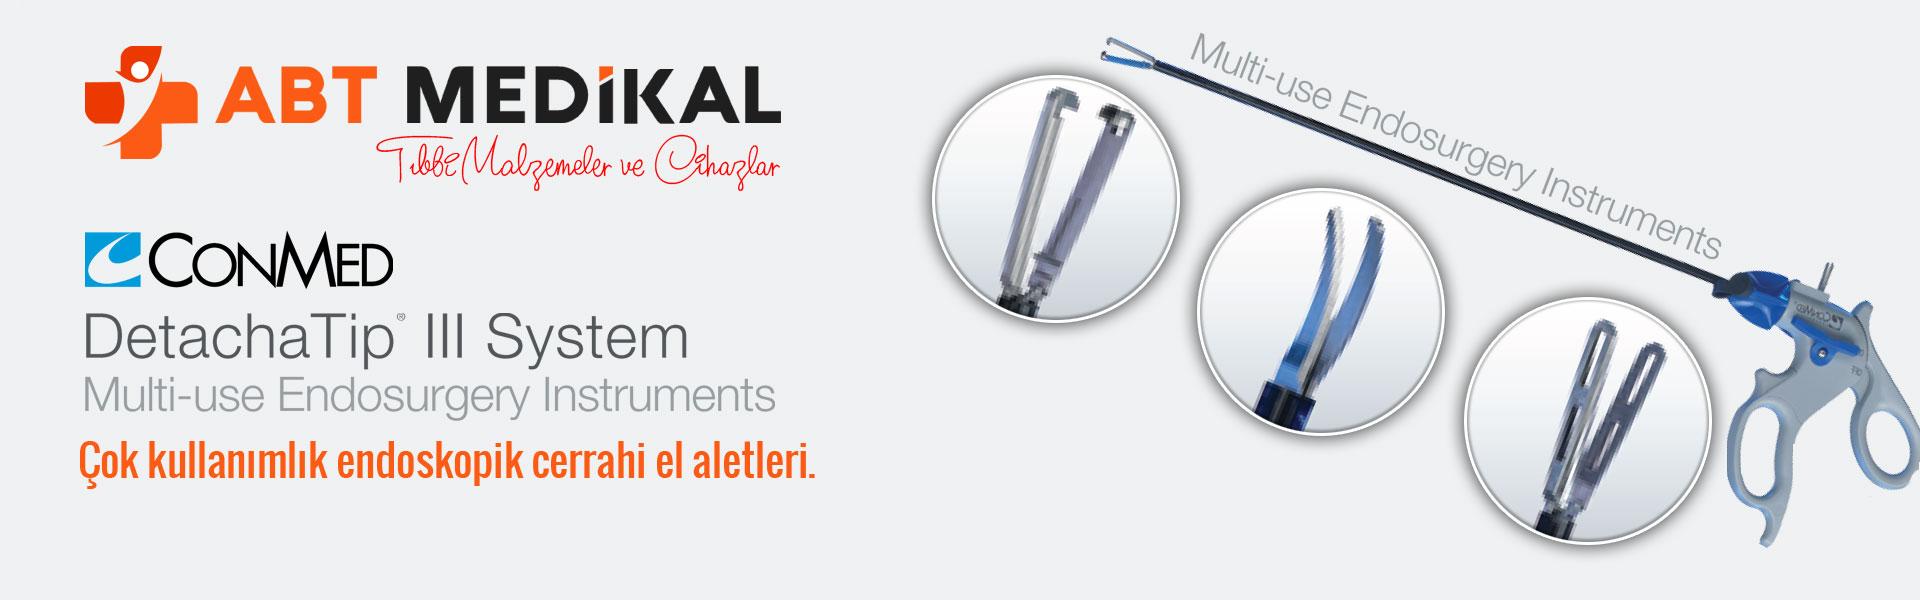 CONMED-Detacha-Tip-3-Sistem-ABT-Medikal-urunu